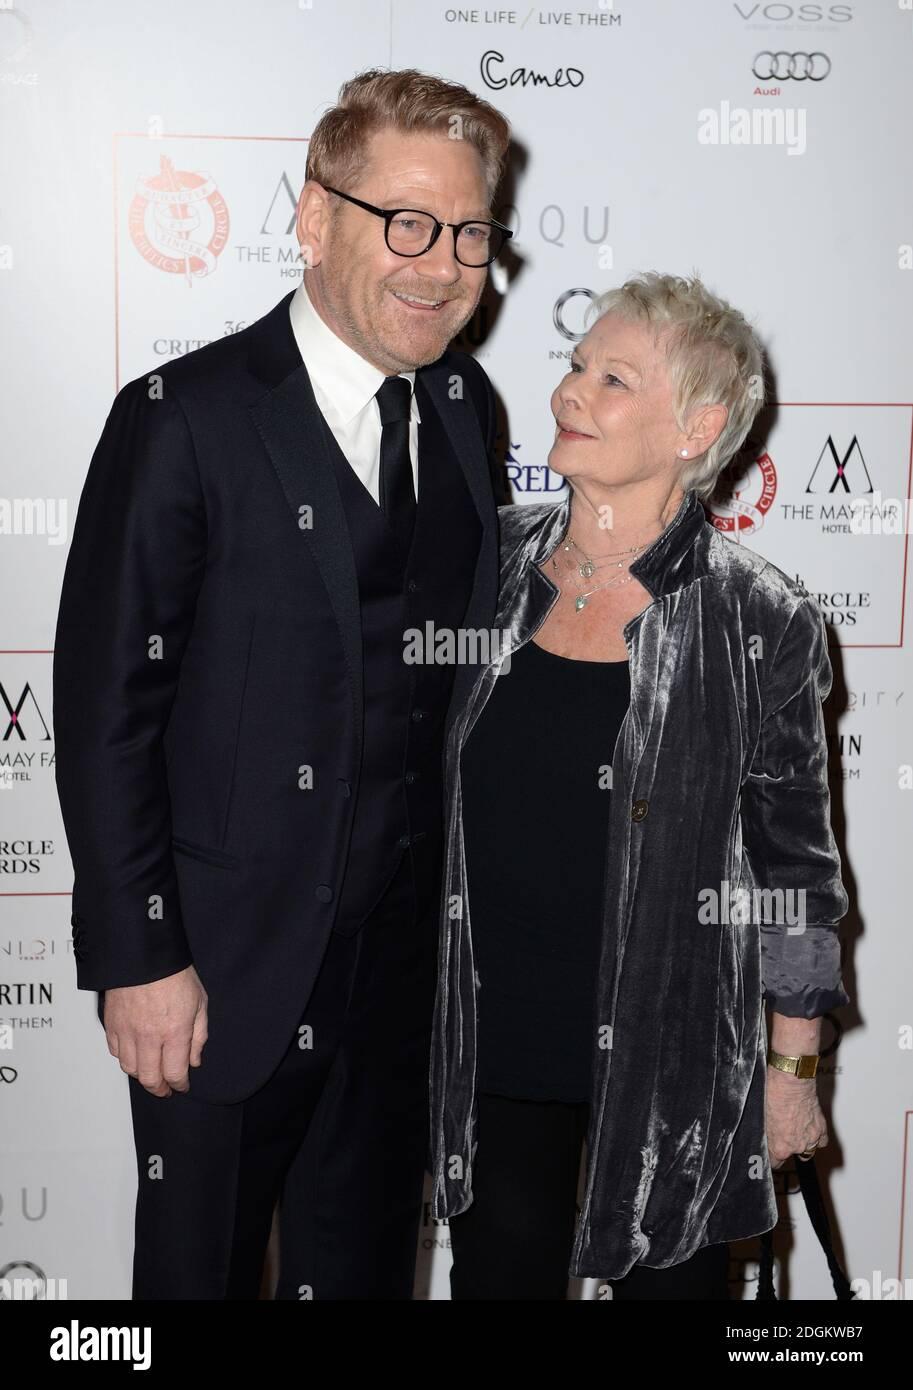 Kenneth Branagh et Dame Judi Dench arrivant aux critiques Circle film Awards 2016, The May Fair Hotel, Londres. Banque D'Images